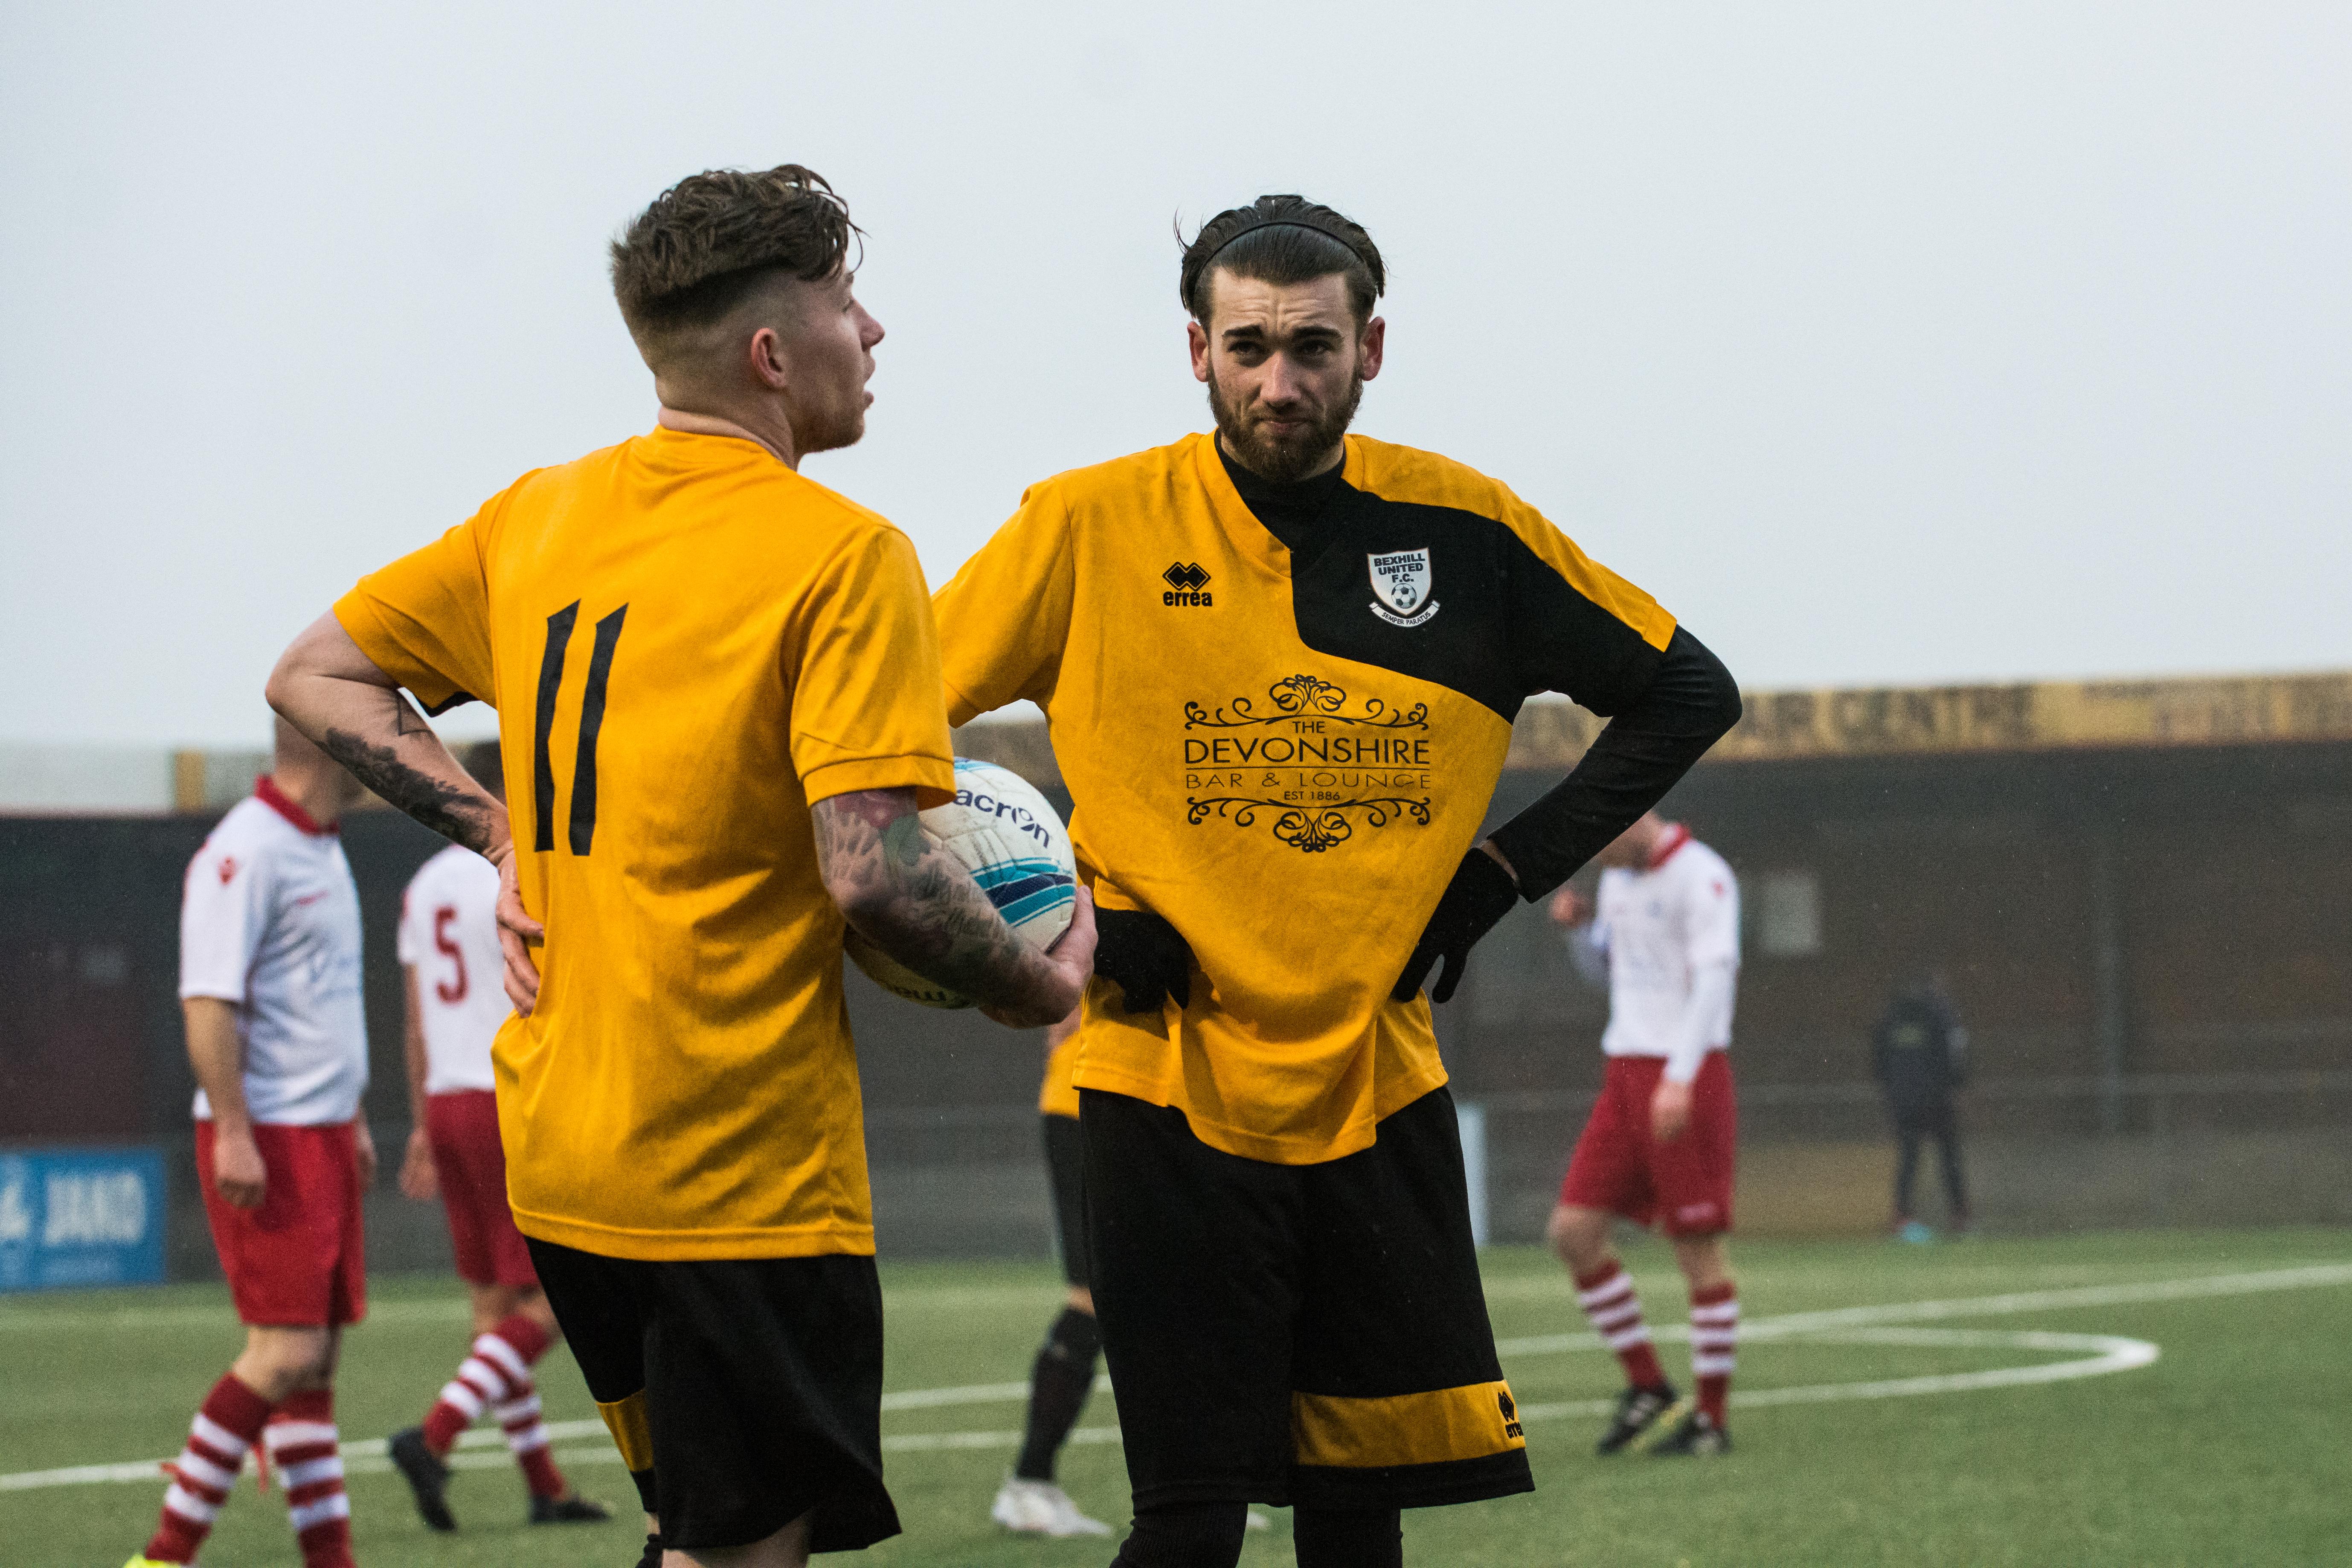 DAVID_JEFFERY Langney Wanderers FC vs Bexhill United FC 03.03.18 86